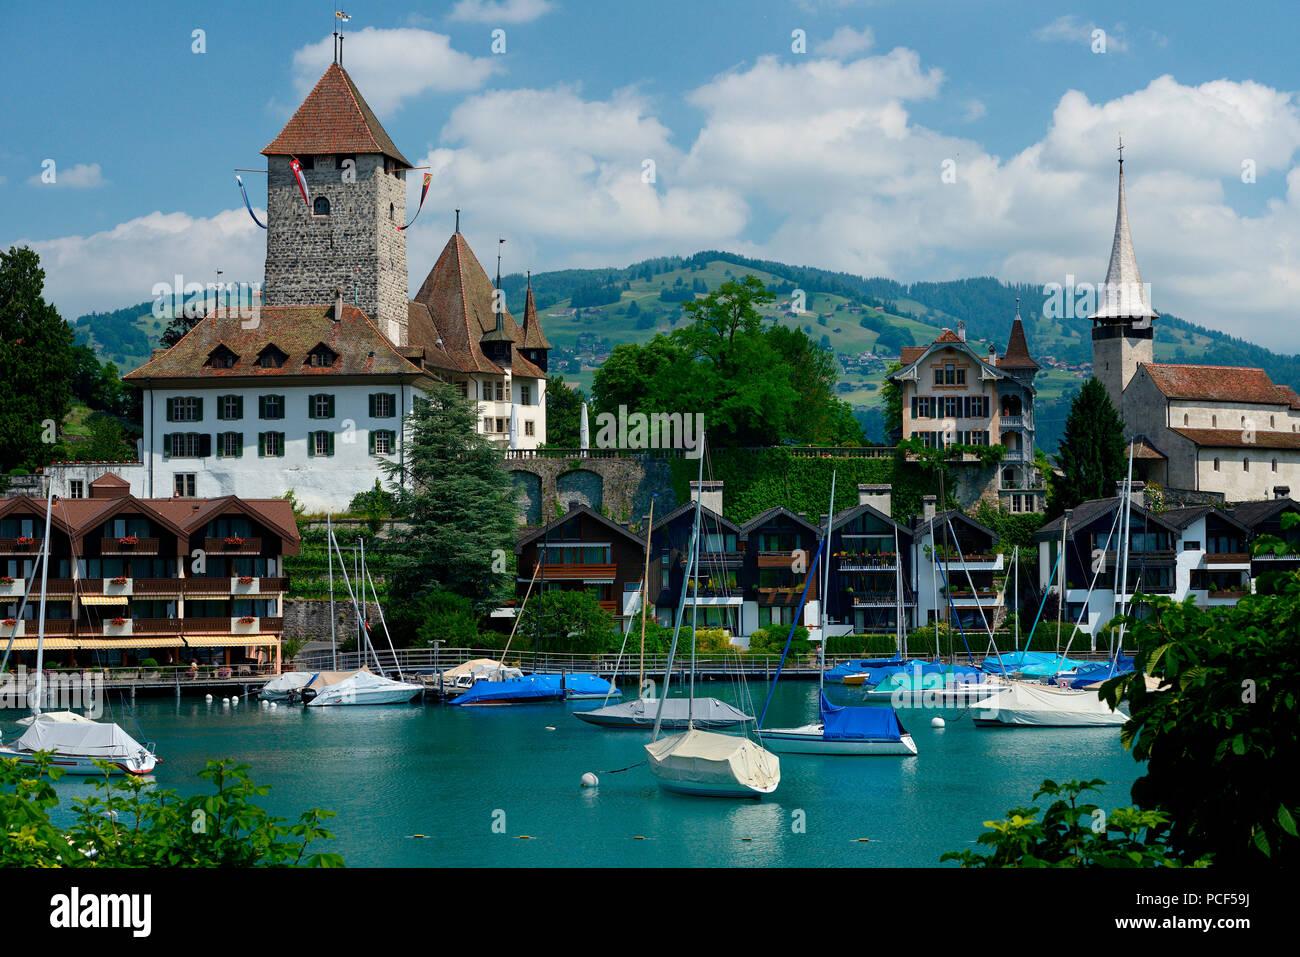 Schloss Spiez, Spiez am Thunersee, Niedersimmental, Kanton Bern, Schweiz - Stock Image